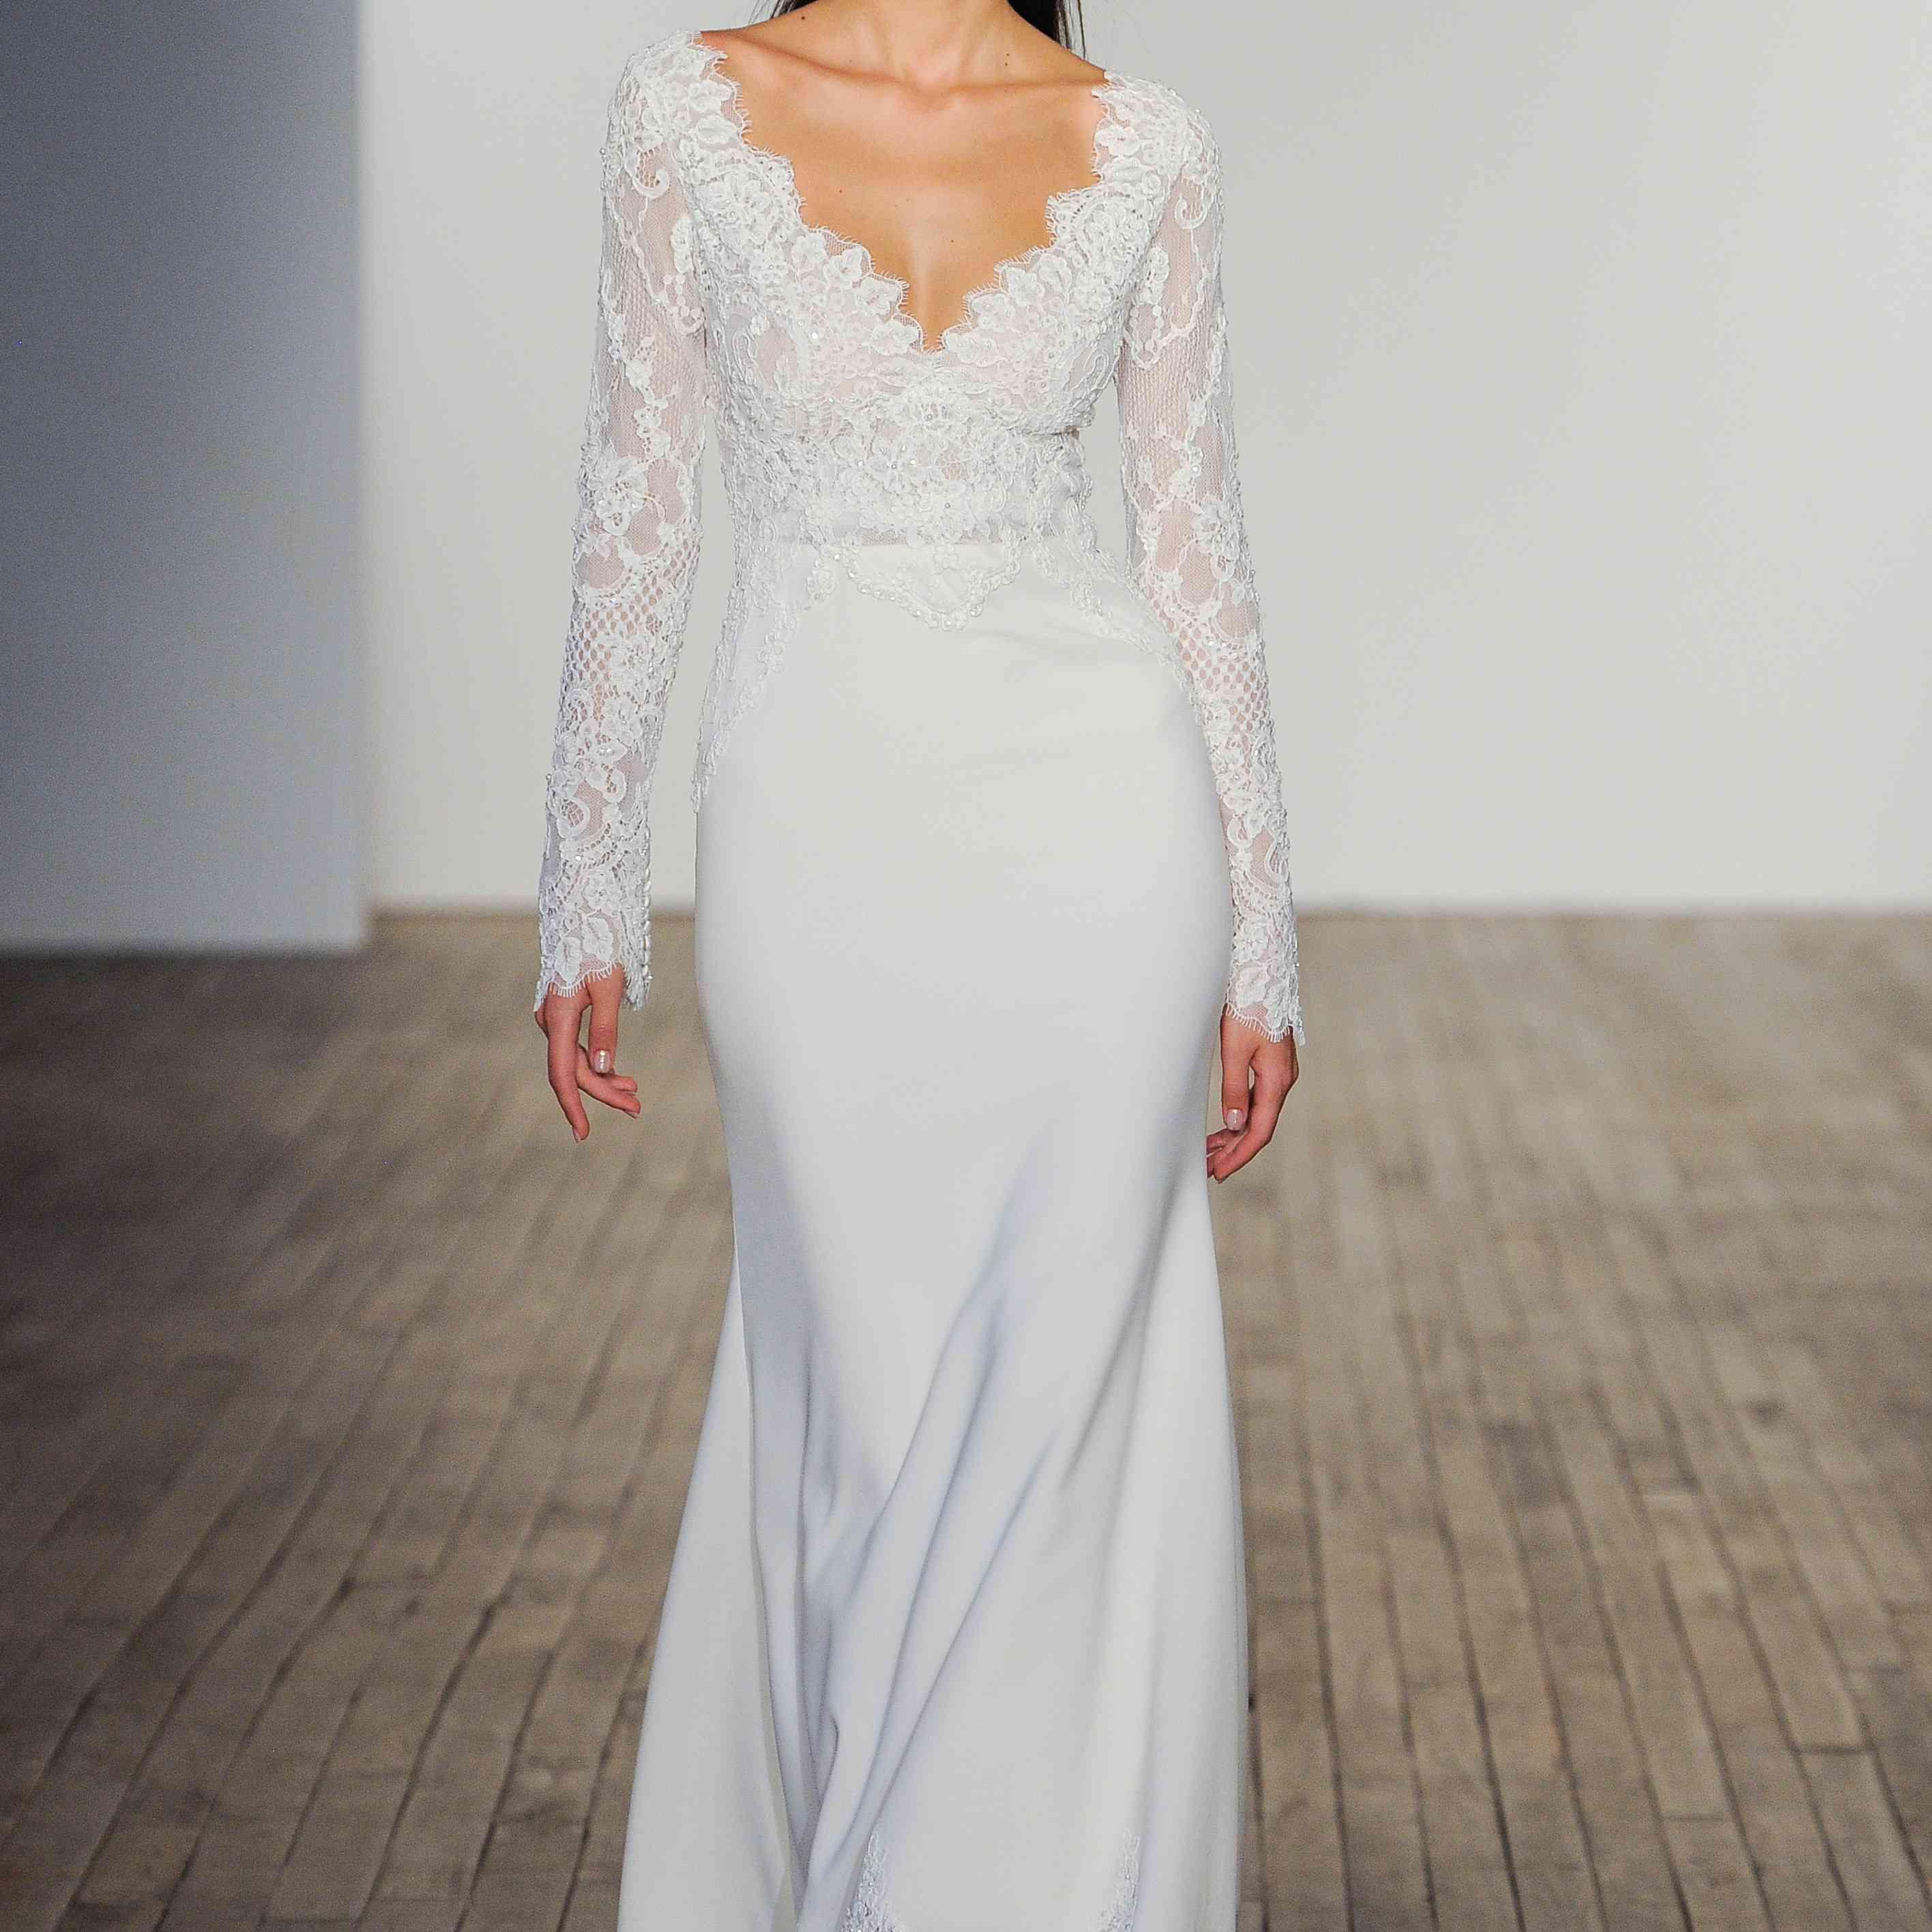 Marilyn long sleeve wedding dress